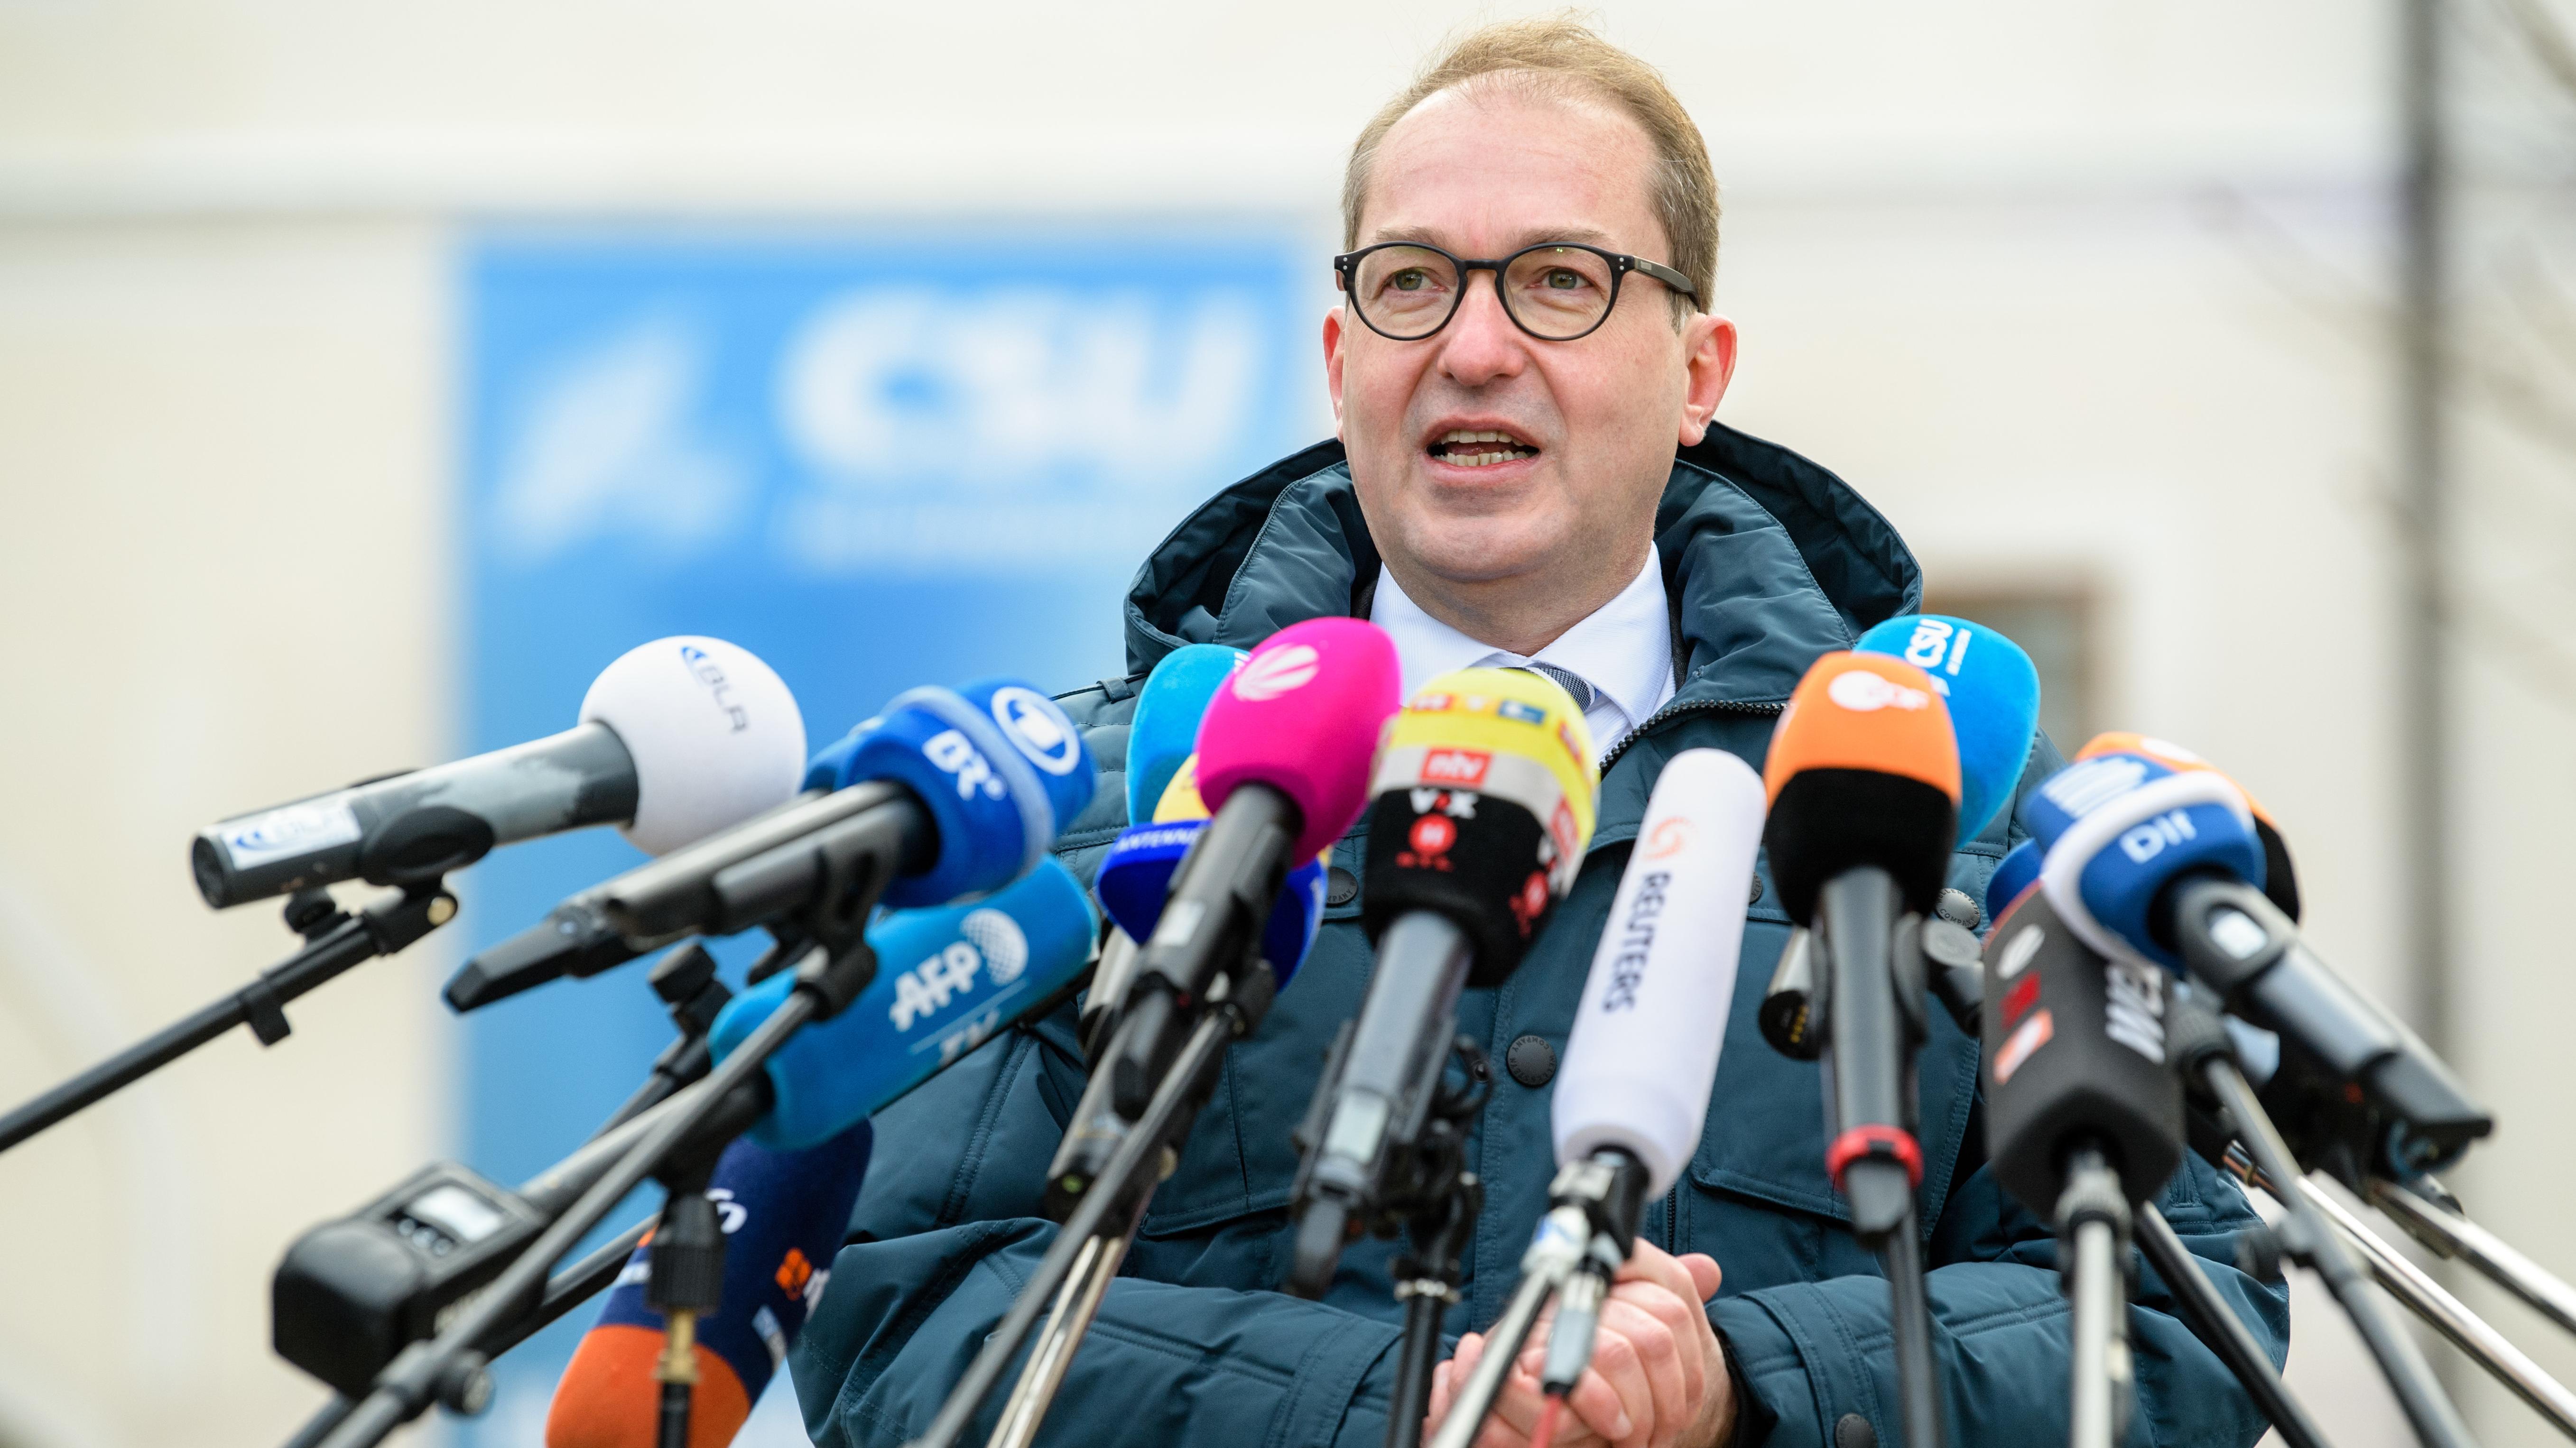 Archivbild: Alexander Dobrindt, CSU-Landesgruppenchef